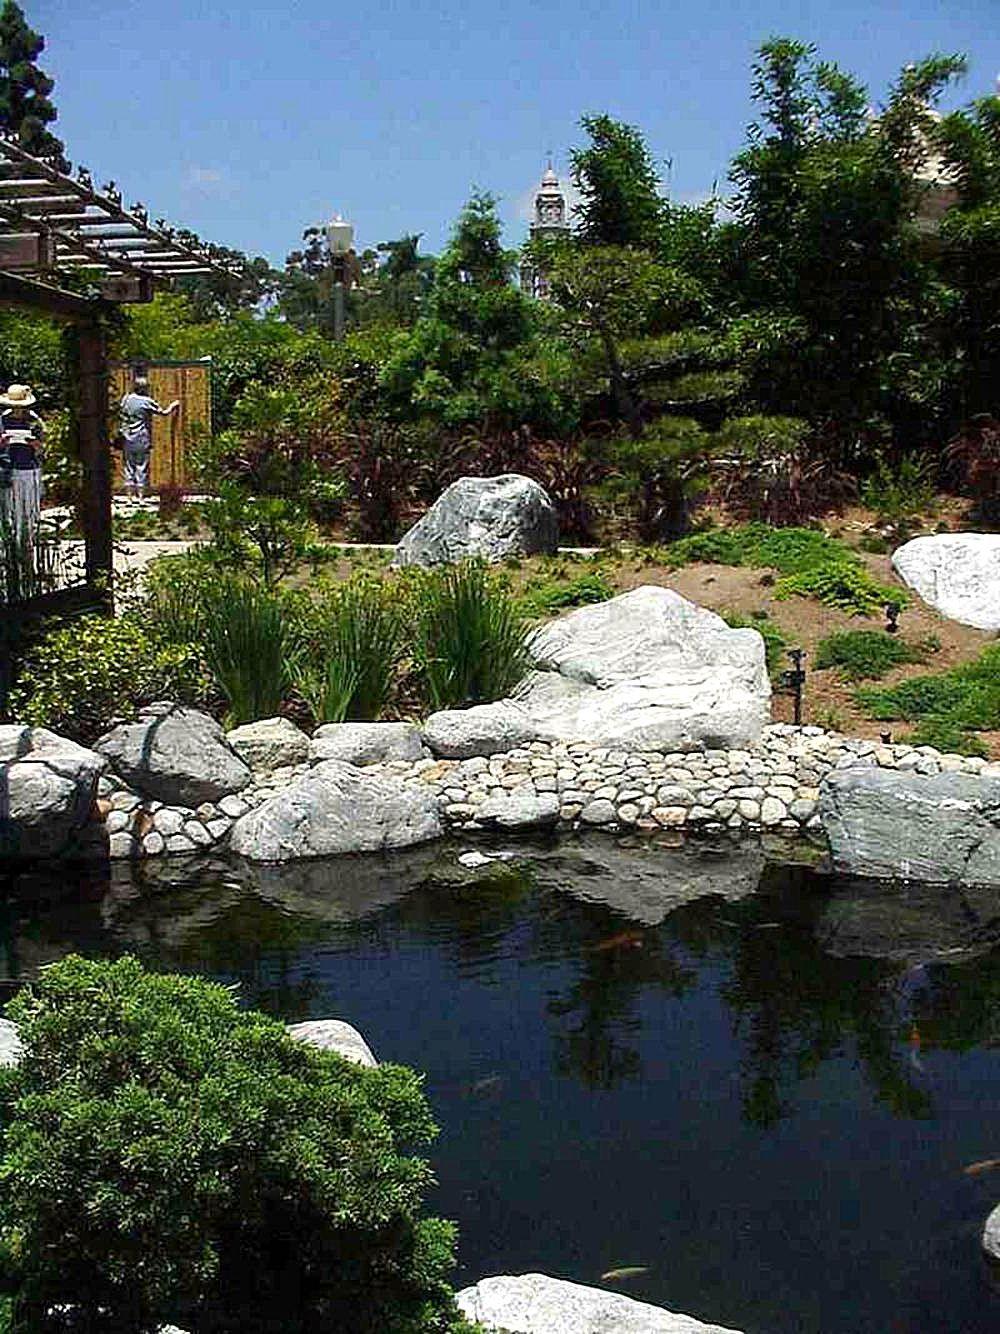 Free picture friendship garden balboa park pond for Balboa lake fishing